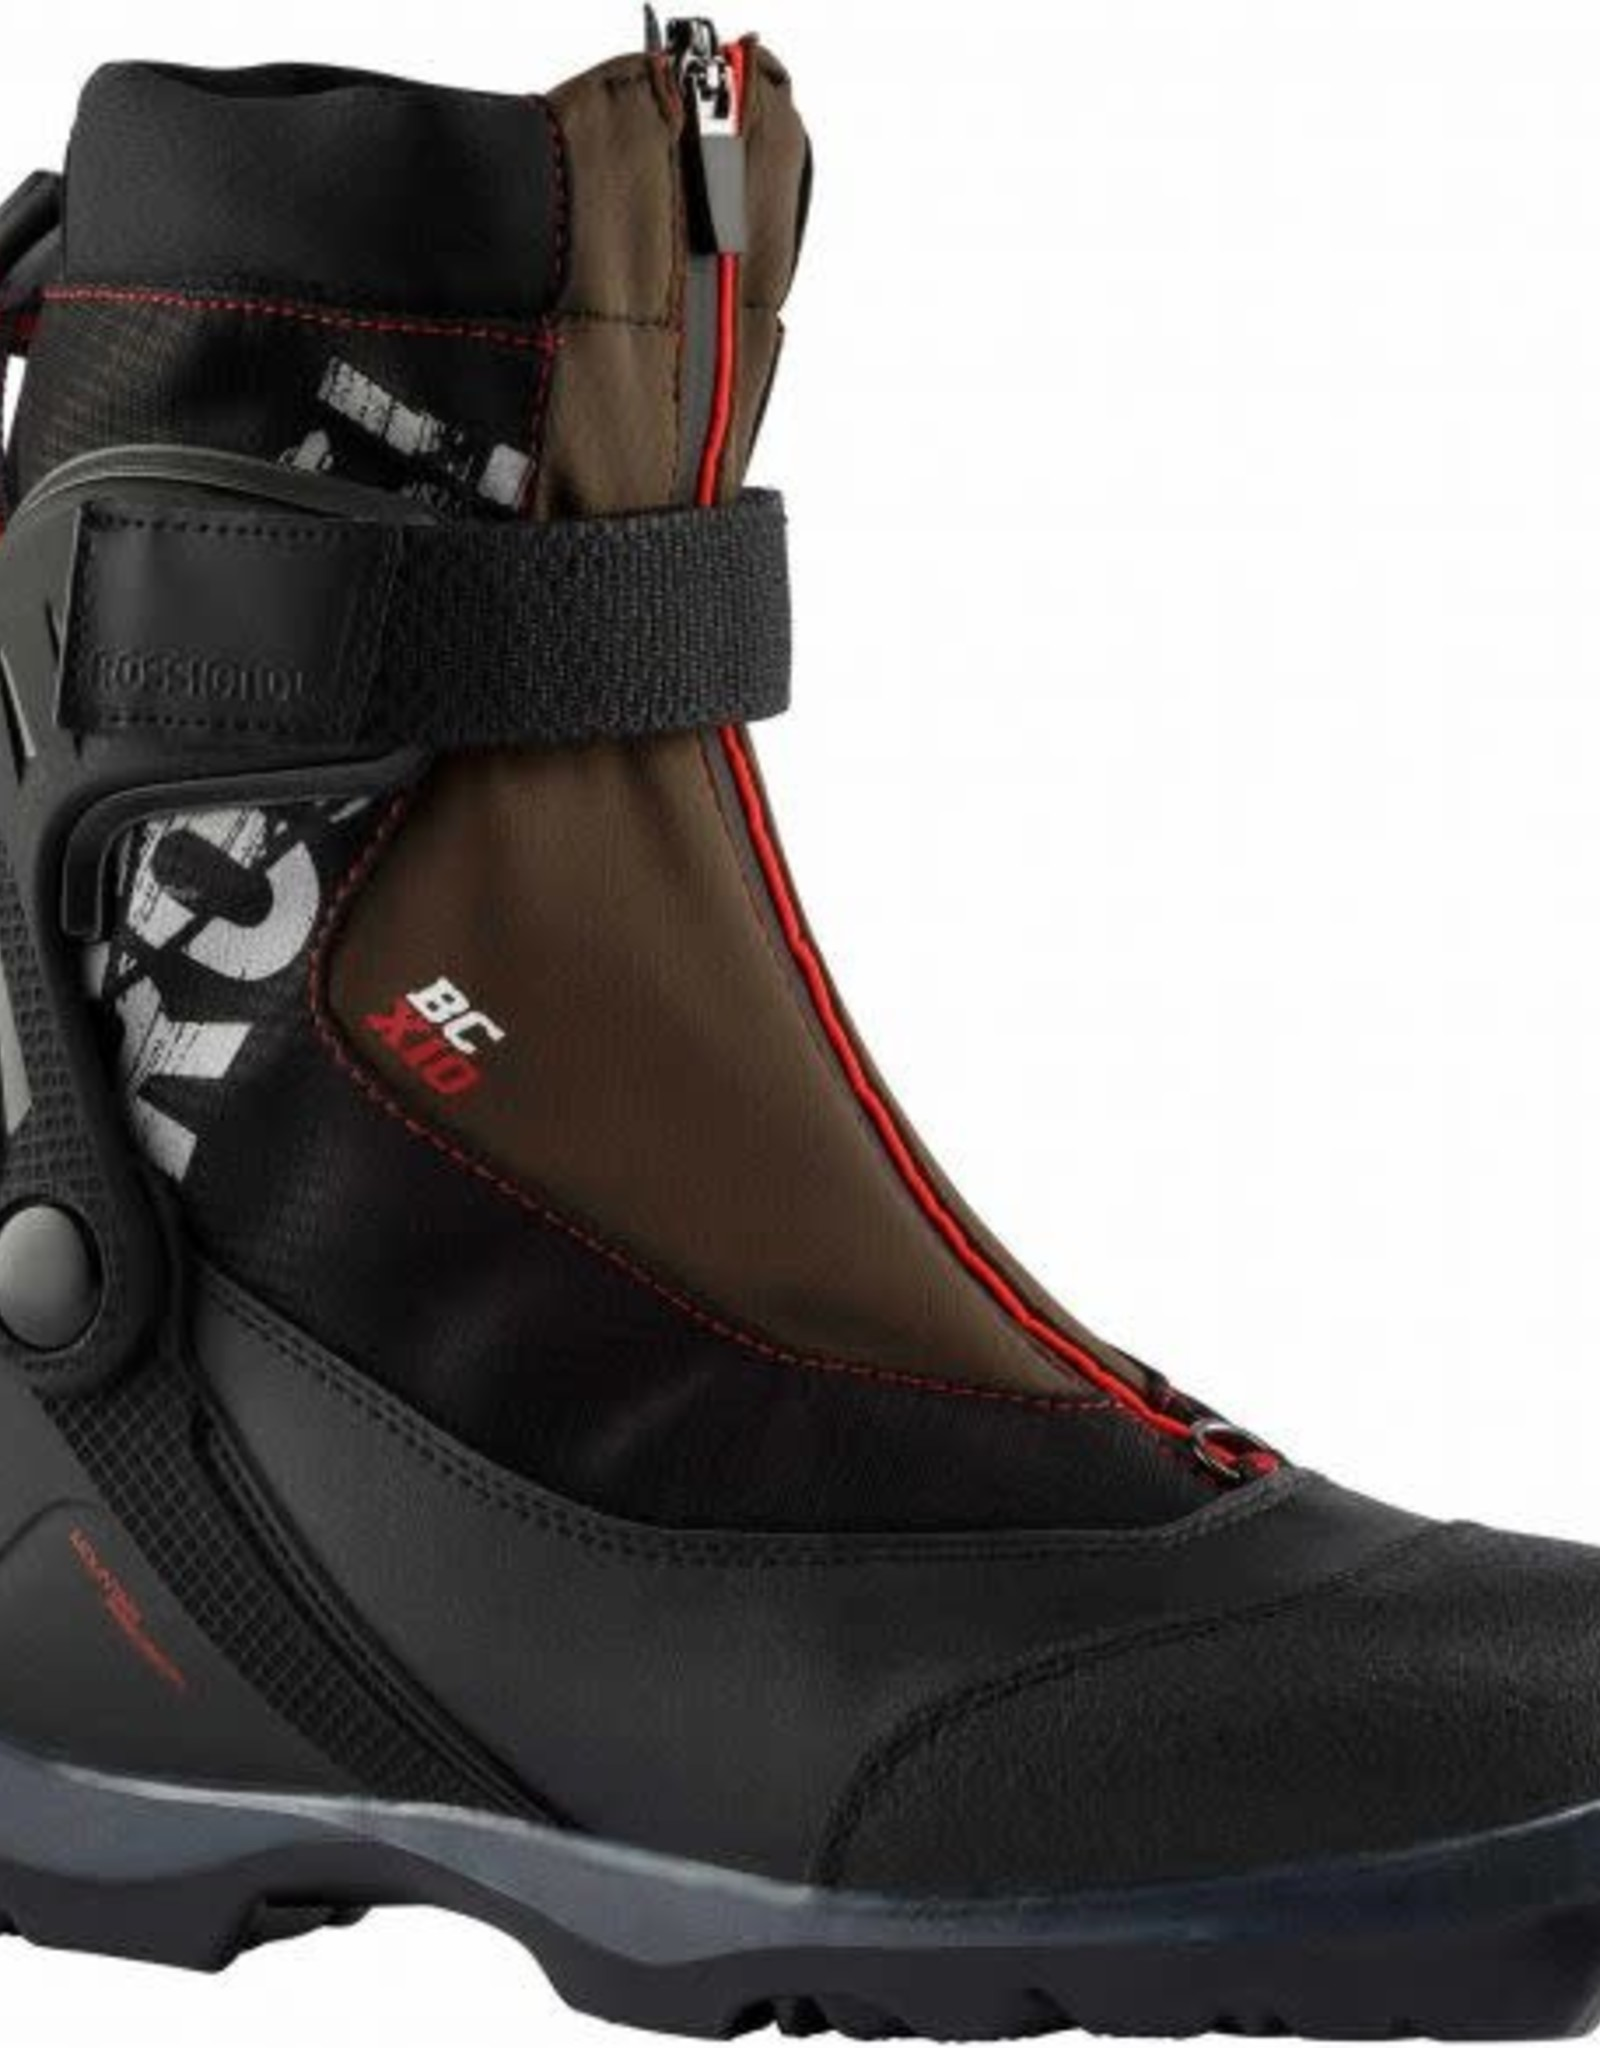 Rossignol 2022 BC X10 NNNBC Boot